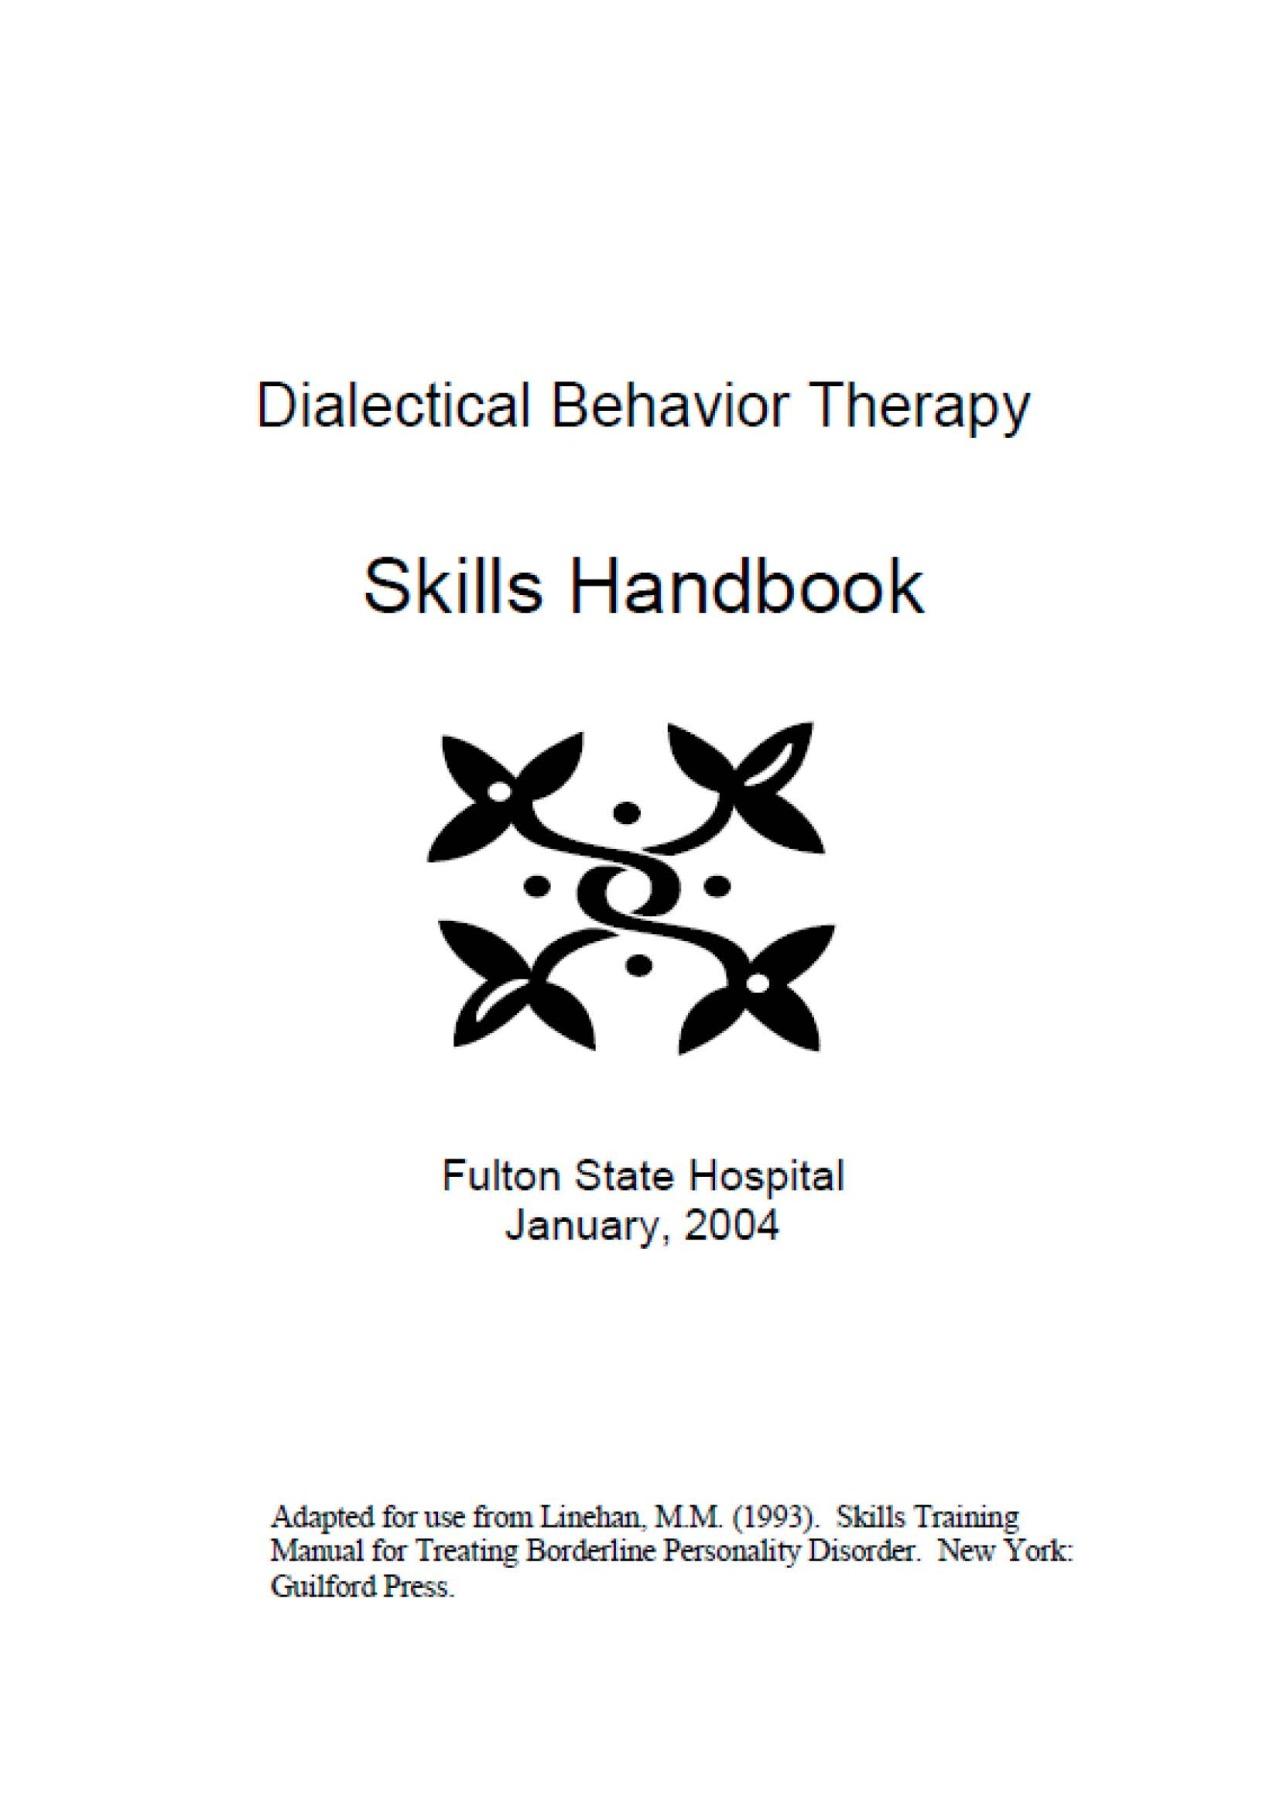 Healingschemas Dbt Skills Resources Model For